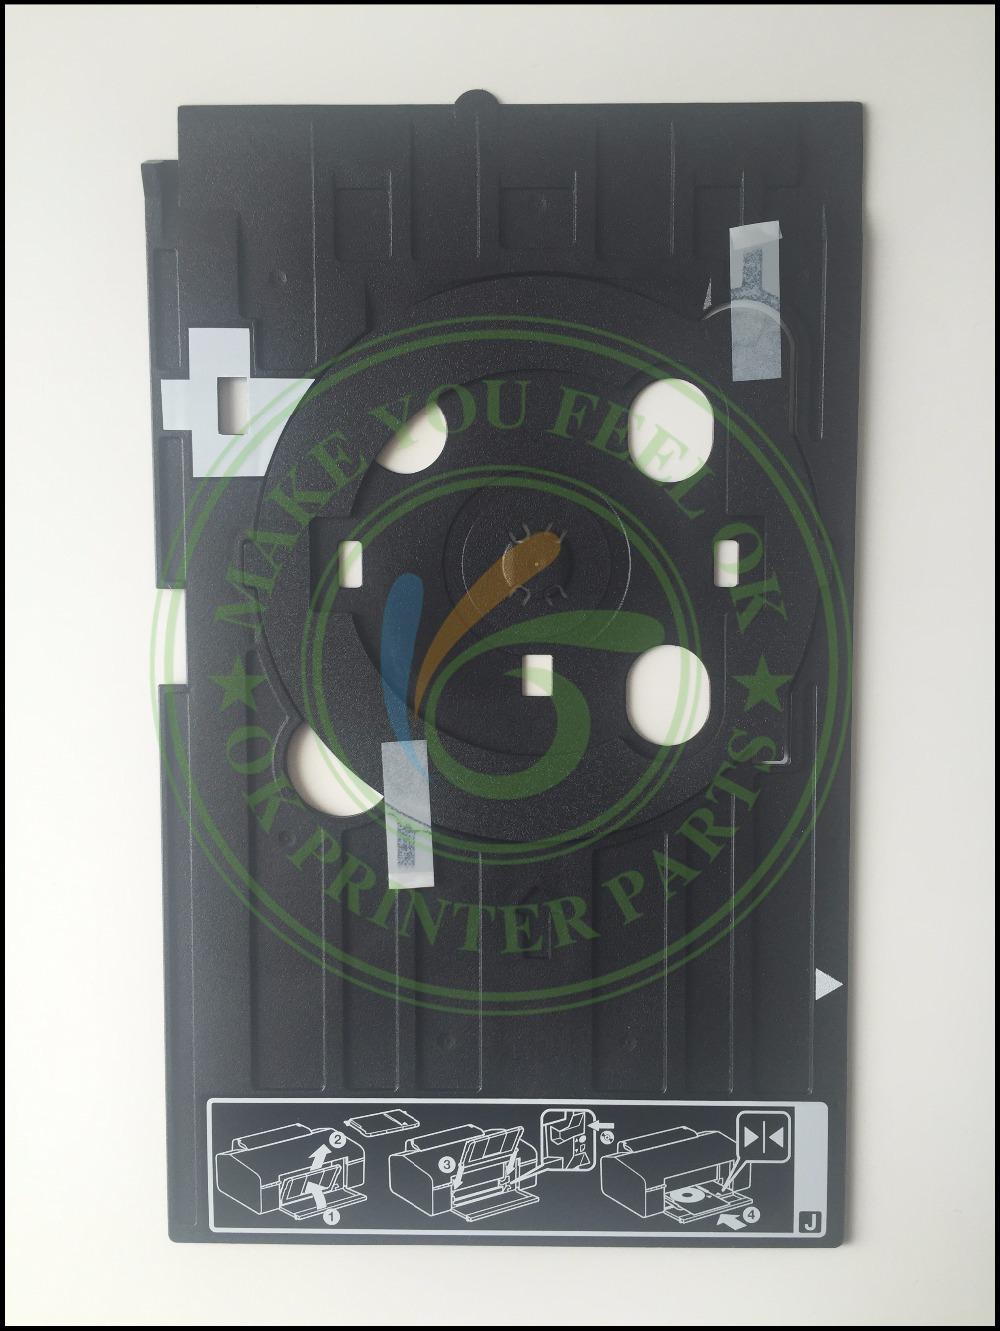 ORIGINAL CD tray DVD VCD tray CD holder Print Tray CD Disc Bracket for Epson R260 R270 R390 R290 R330 T50 T60 A50 P50 L800 L801<br><br>Aliexpress